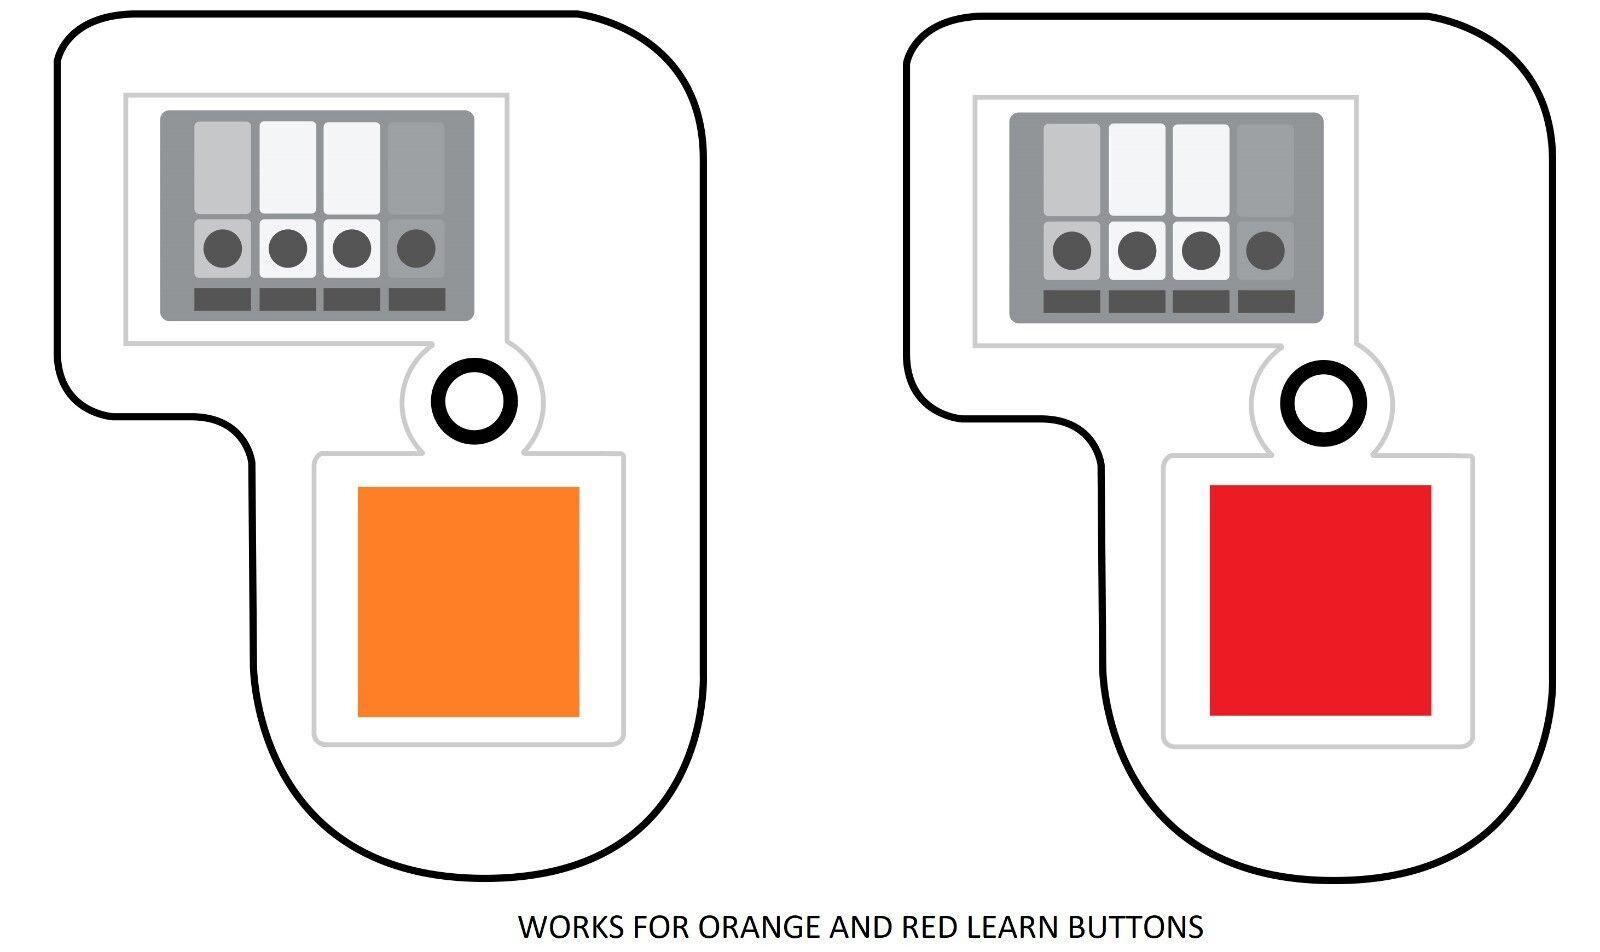 2 Car Garage Door Gate Remote Opener Control Clicker for Liftmaster 971LM 390Mhz